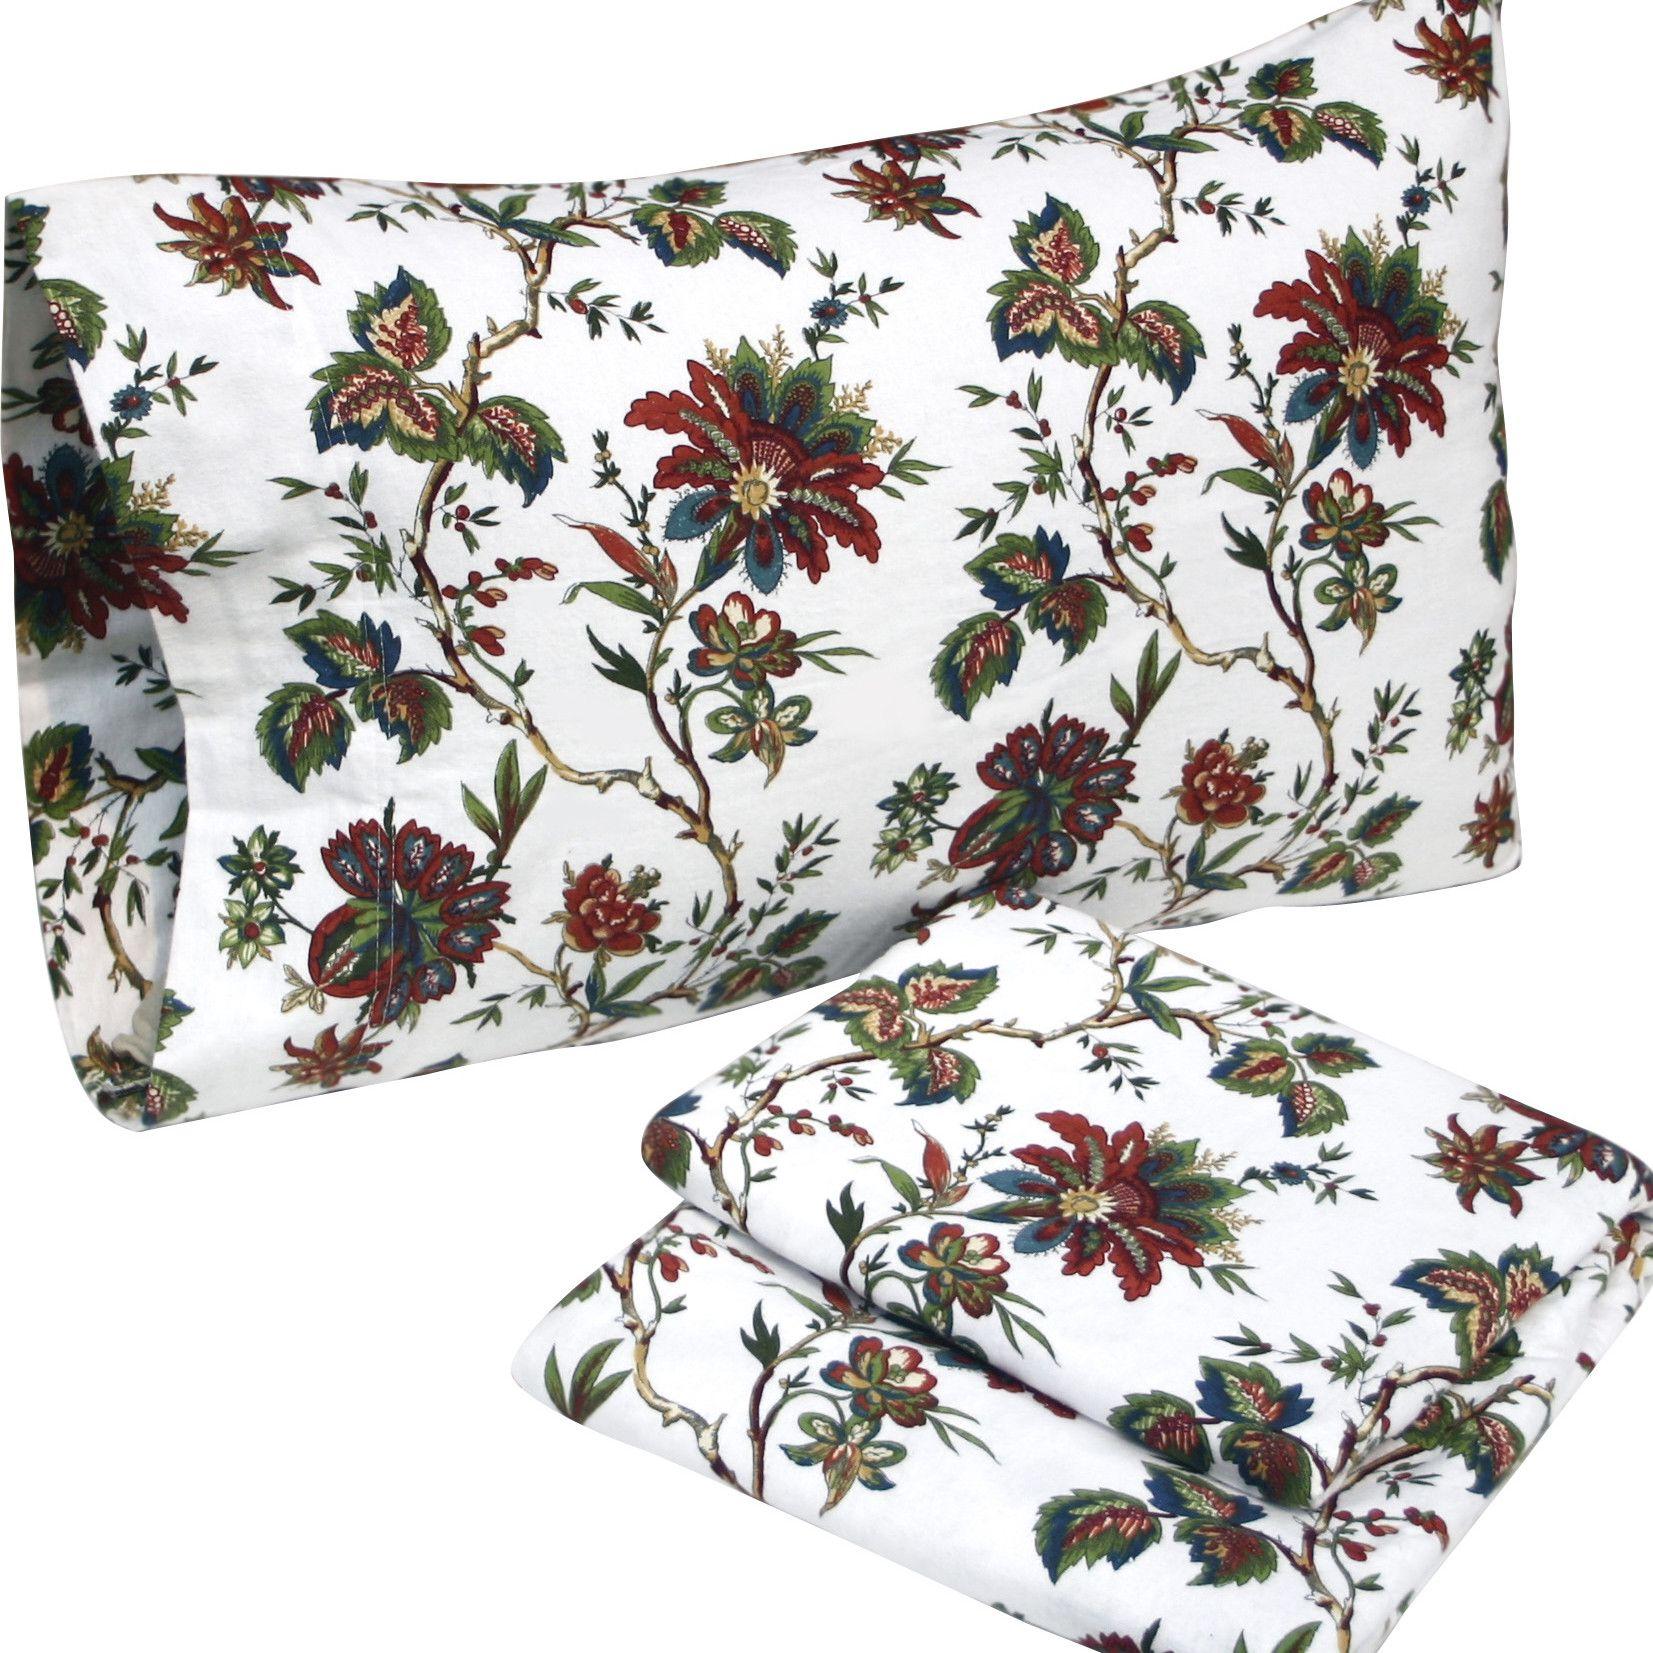 Rainforest Cotton Flannel Sheet Set